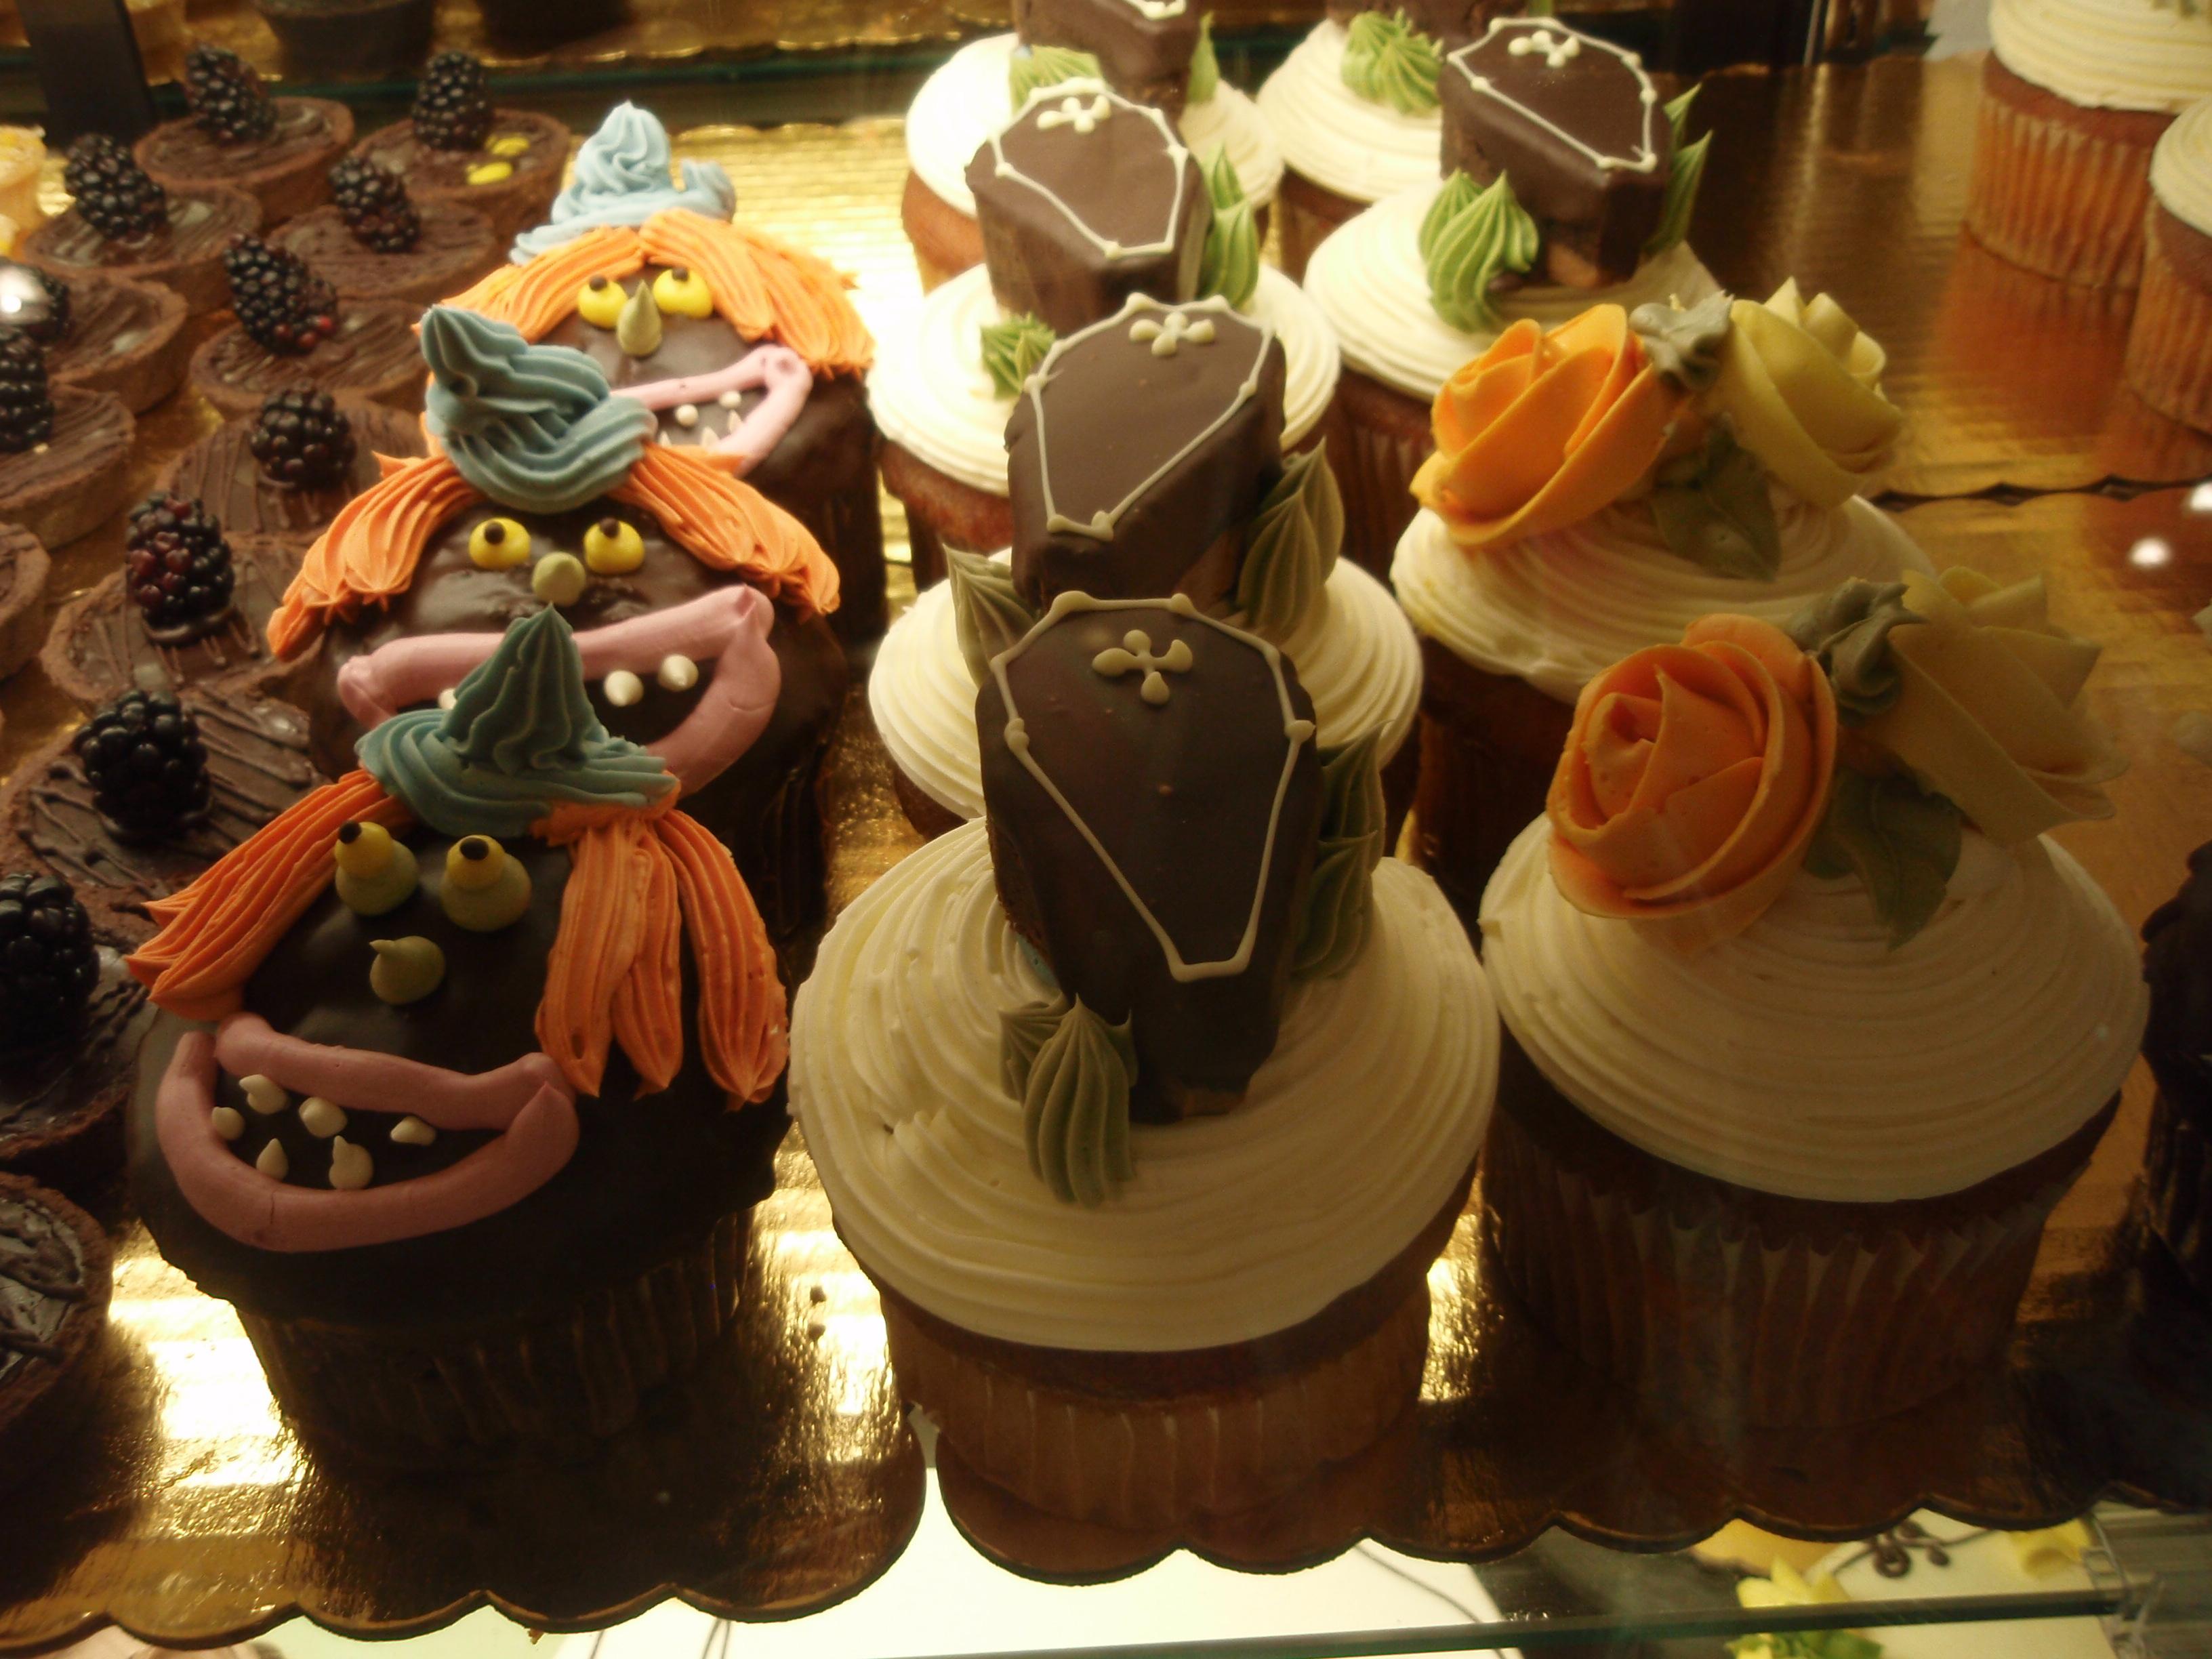 Hotel Transylvania Cake Topper